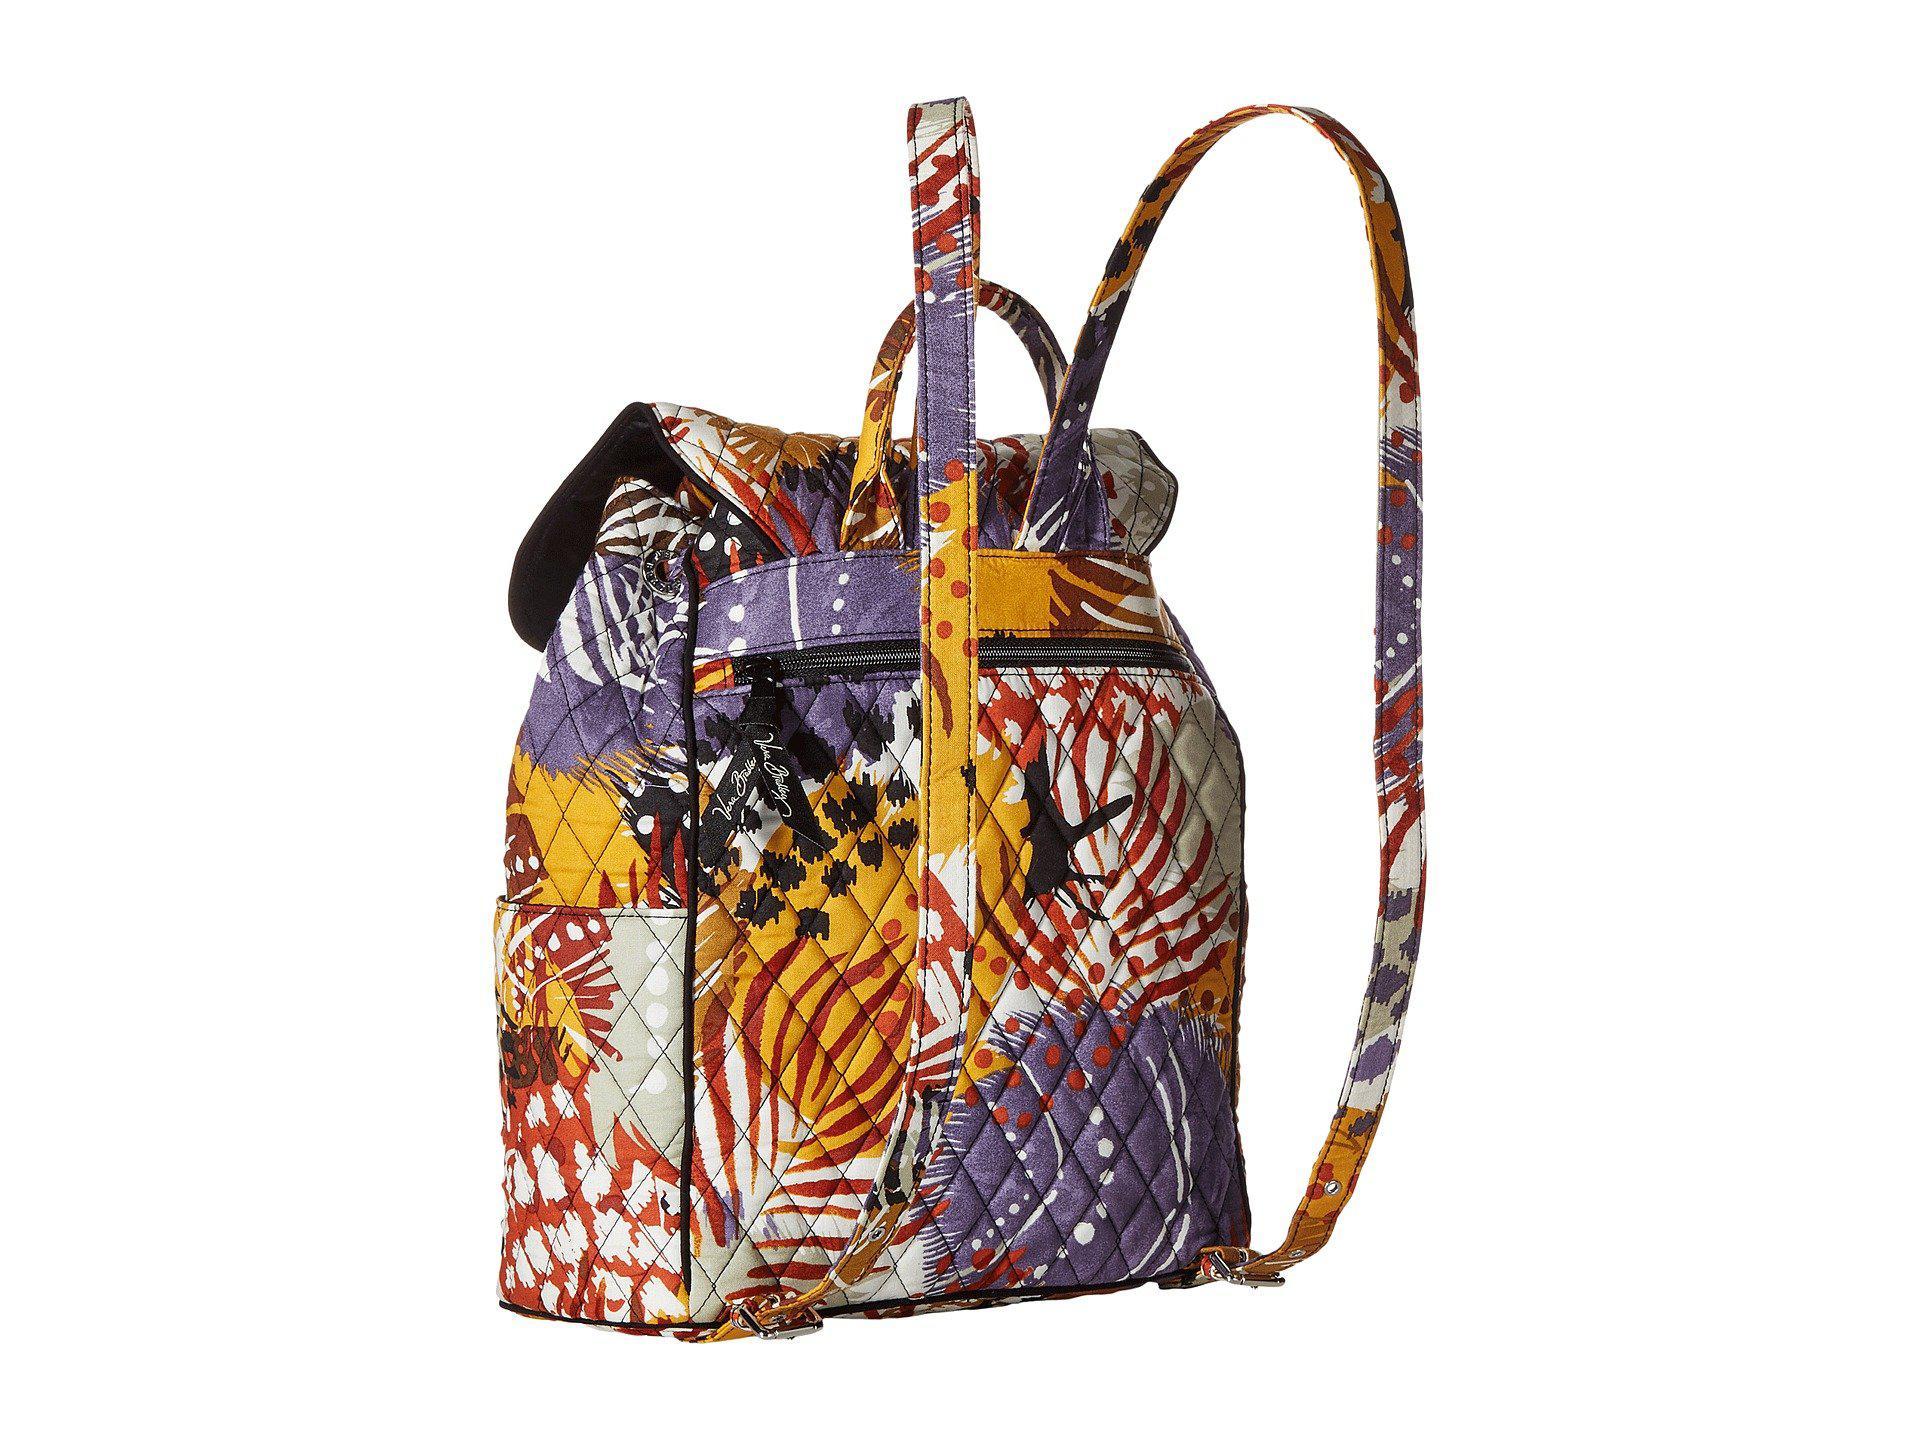 d5e681c261 Vera Bradley - Multicolor Drawstring Backpack - Lyst. View fullscreen